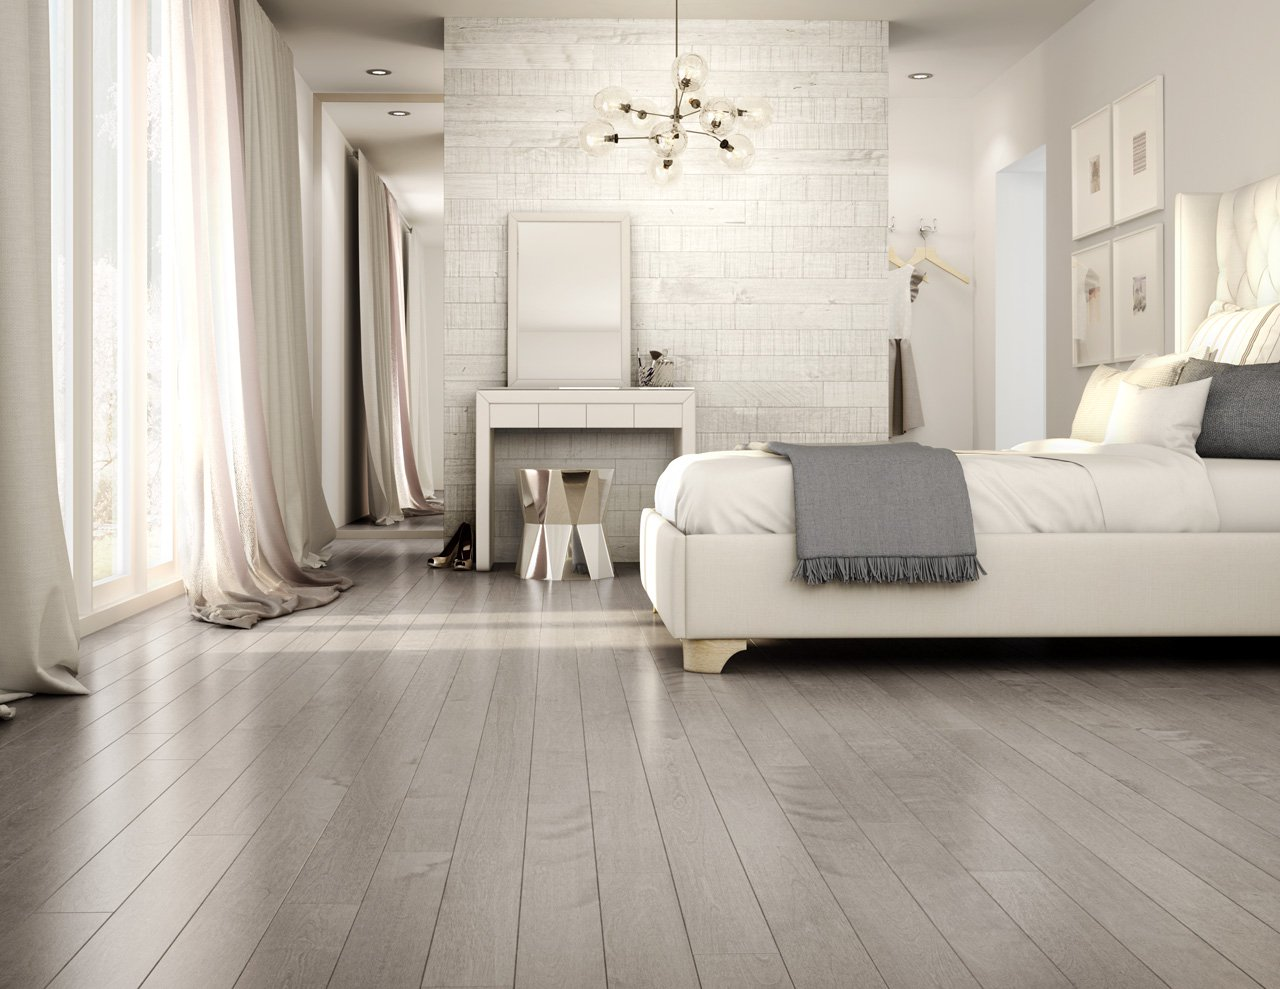 Preveco hardwood flooring